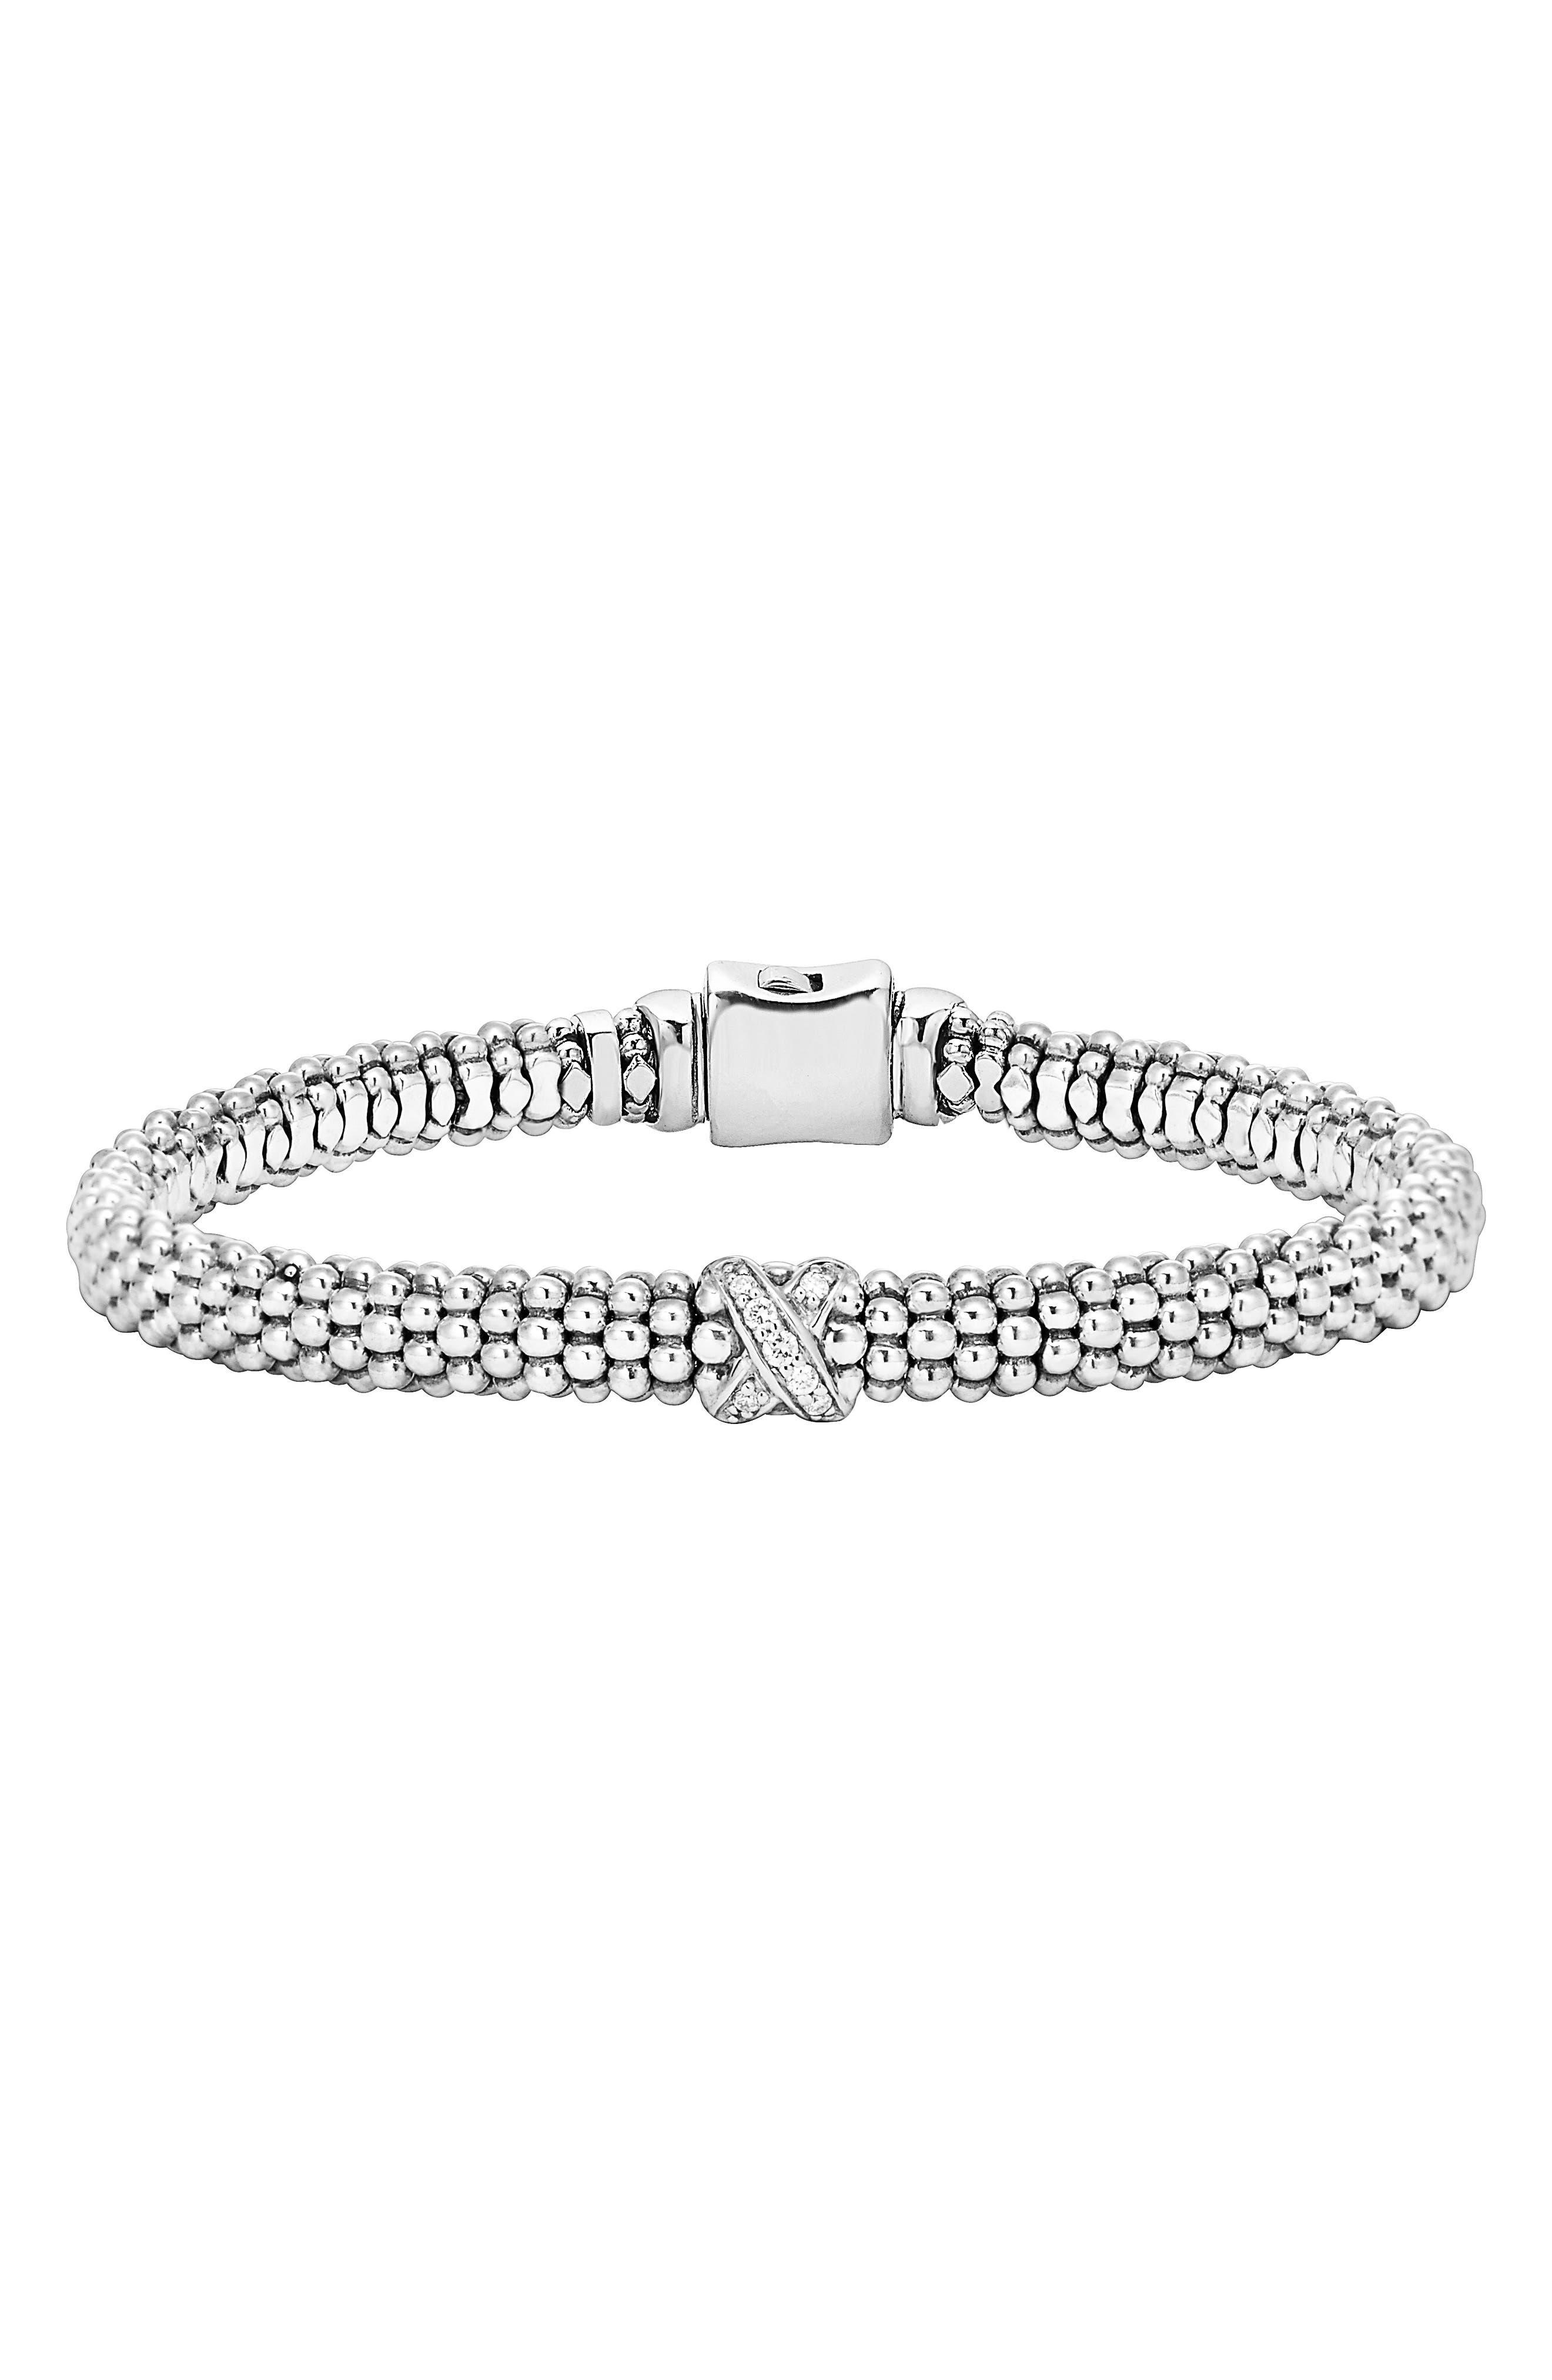 Caviar 'Signature Caviar' Diamond Rope Bracelet,                             Main thumbnail 1, color,                             STERLING SILVER